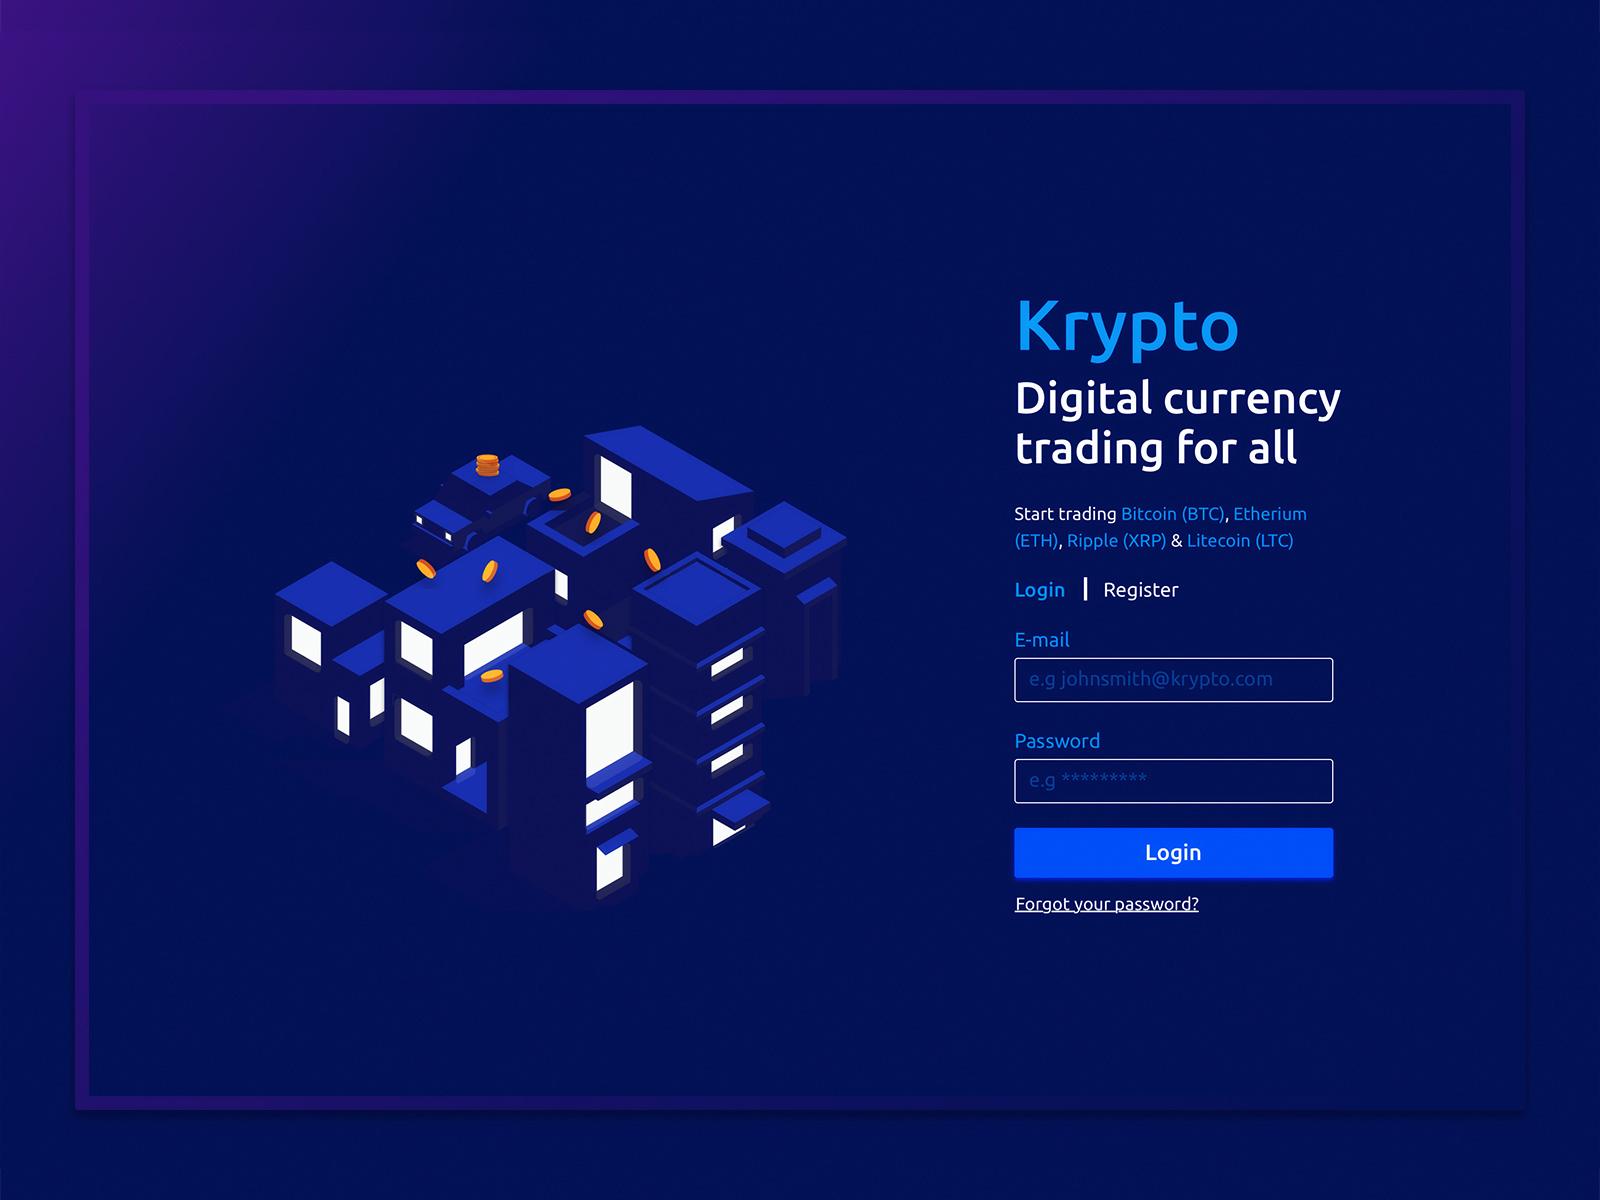 Krypto - Cryptocurrency exchange